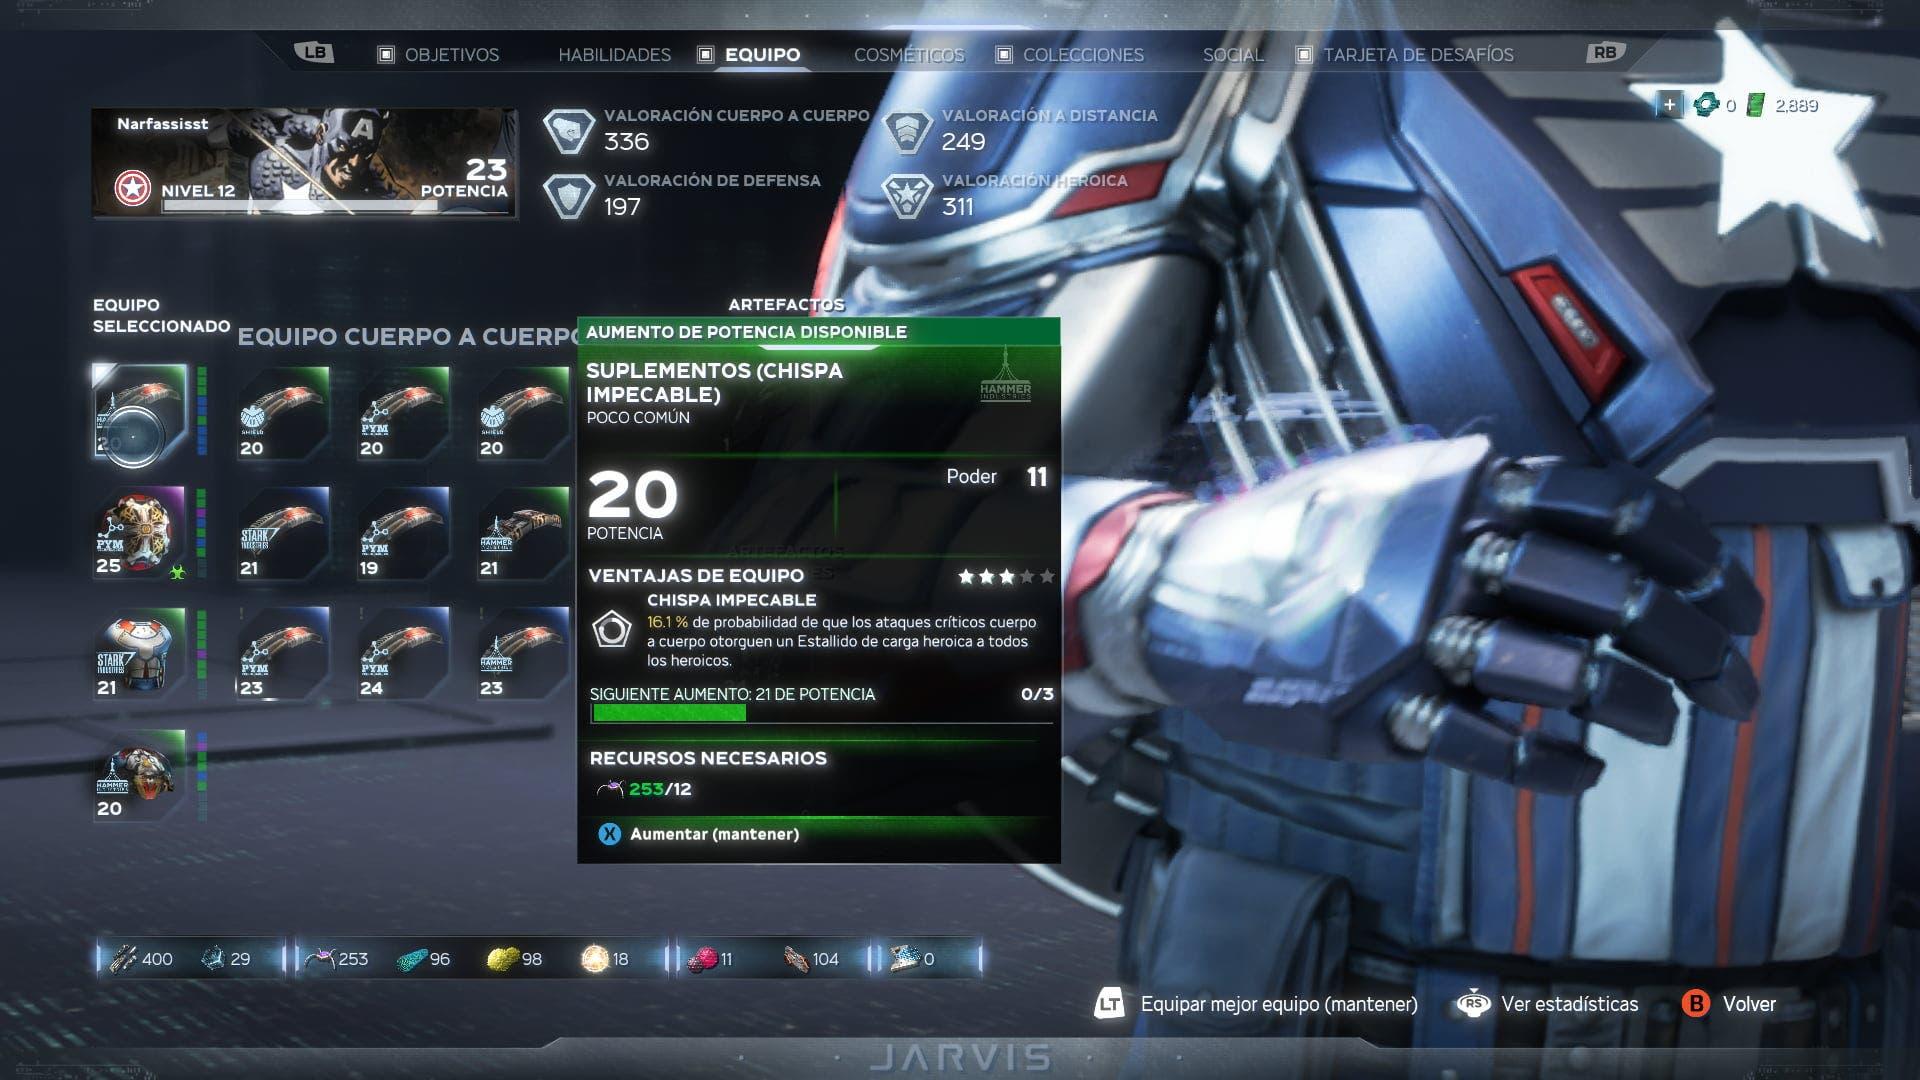 Análisis de Marvel's Avengers - Xbox One 4